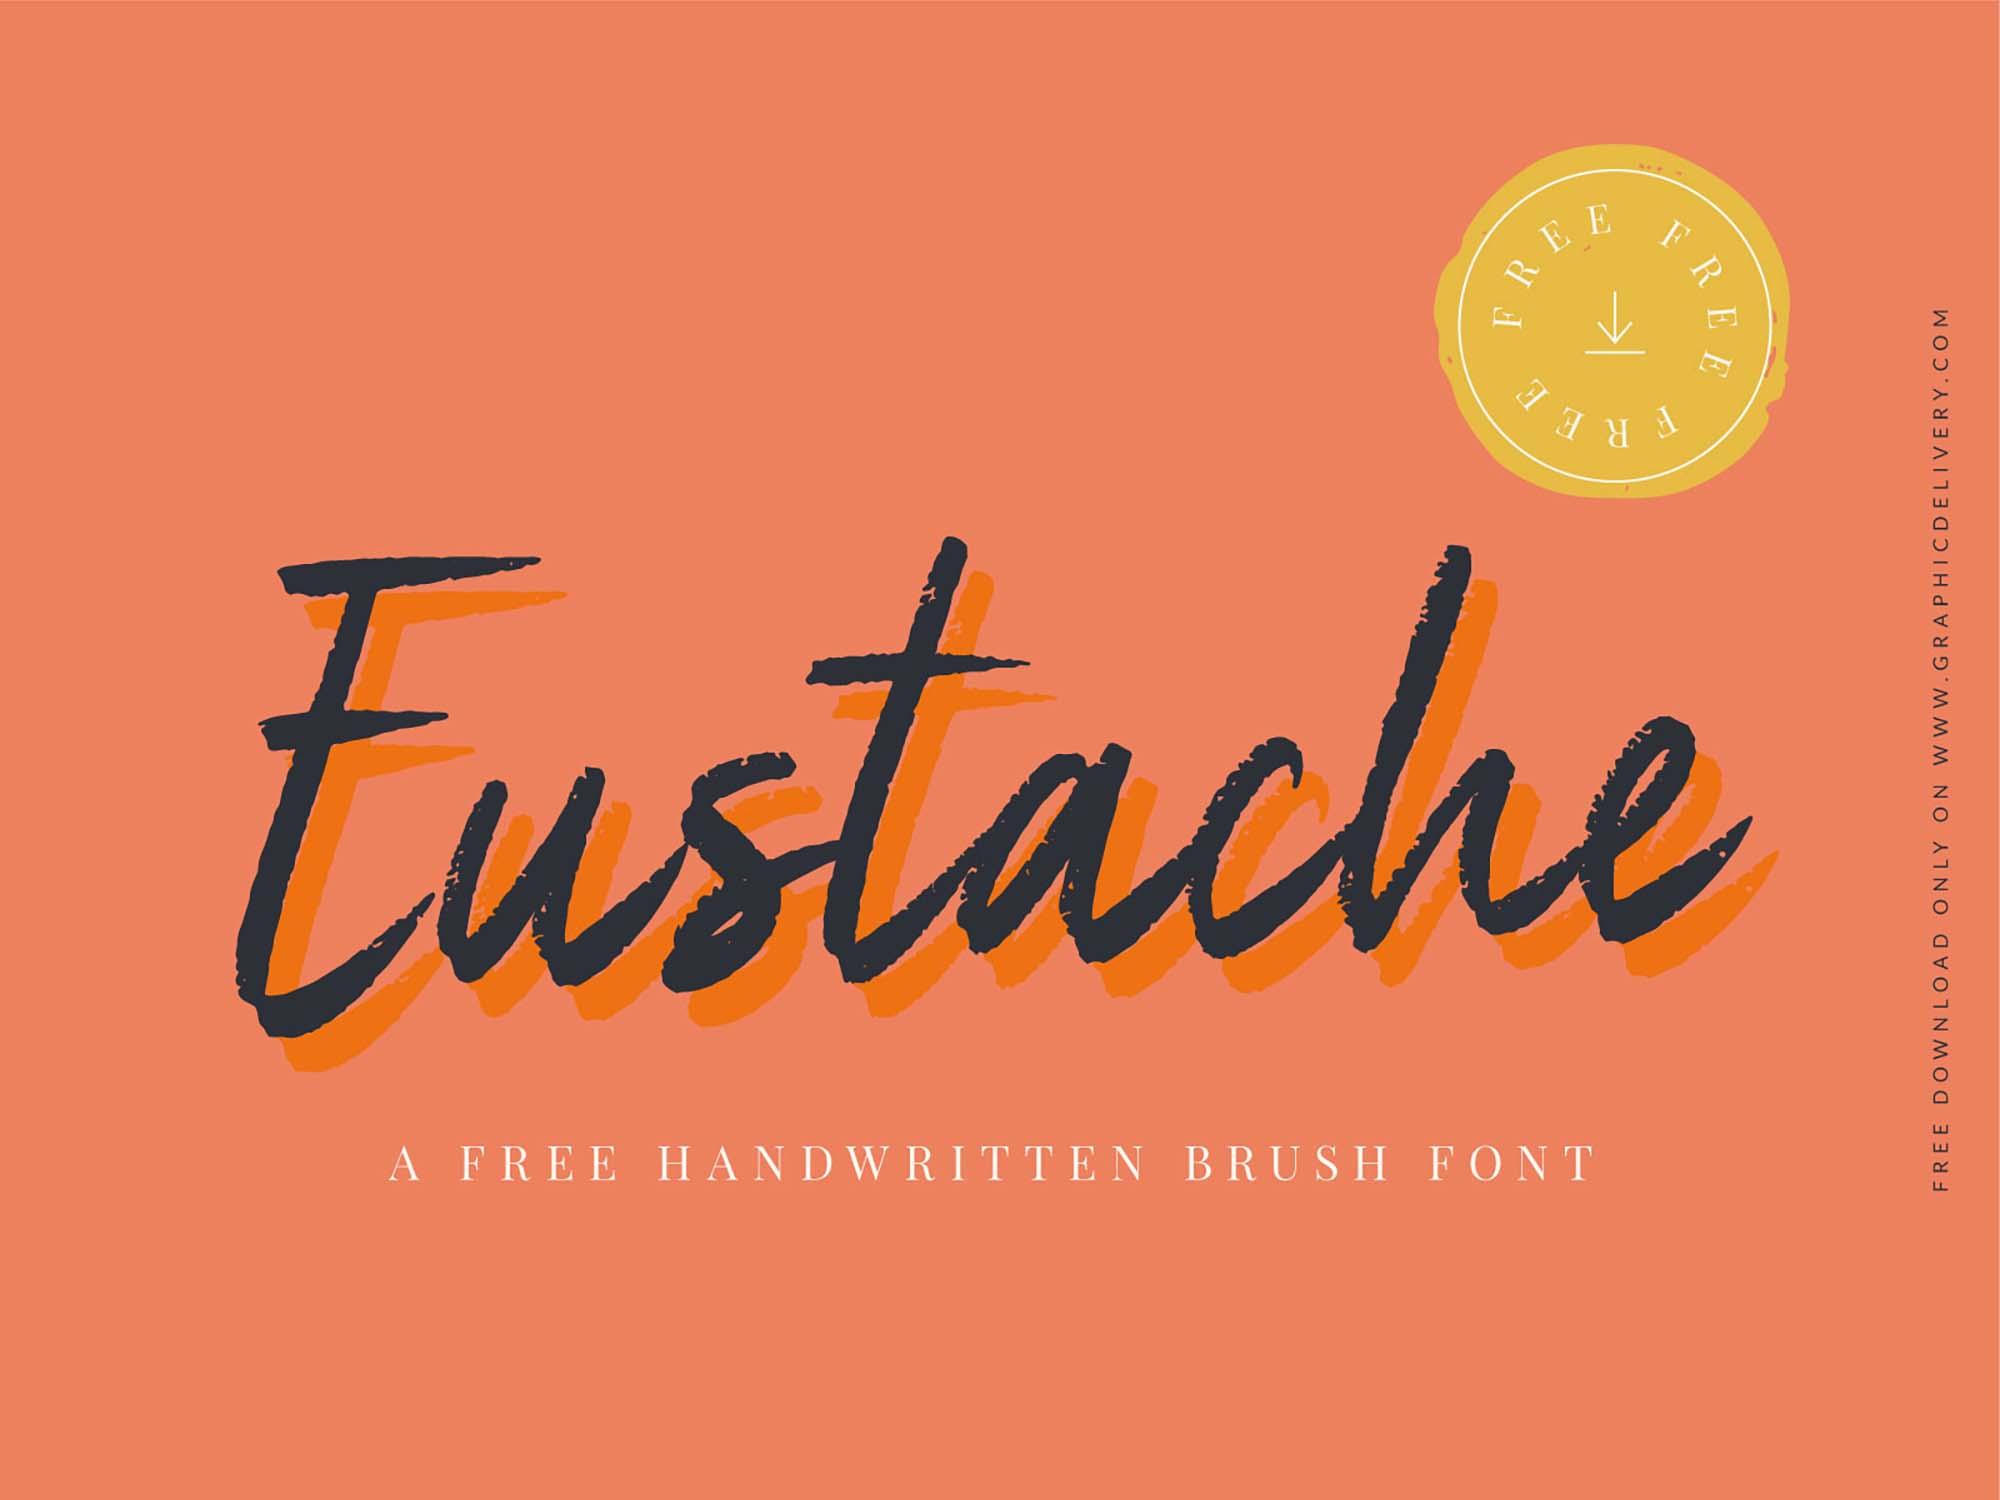 Eustache Font